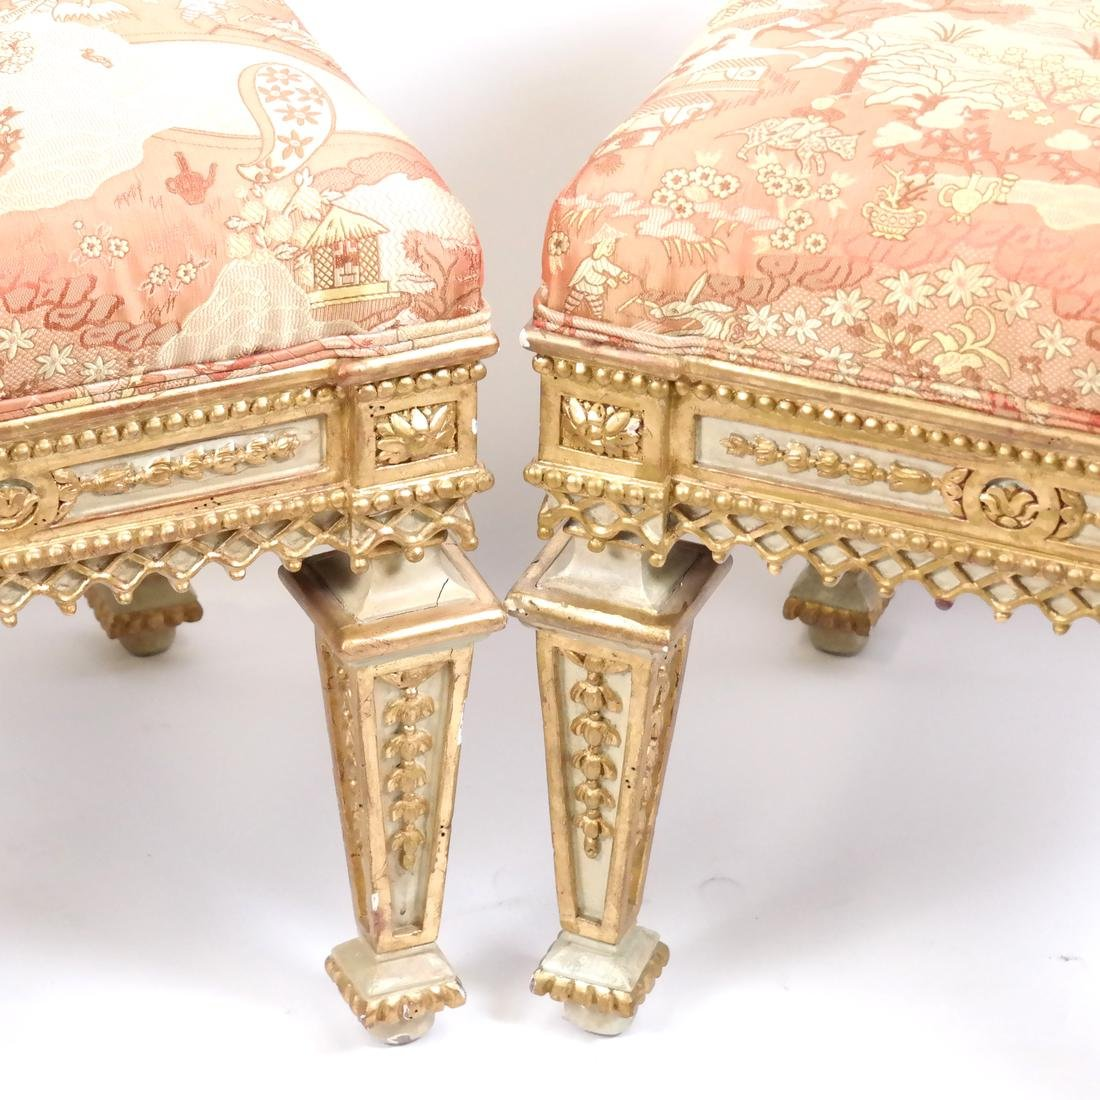 Pair of 19th Century Classical Stools - 2